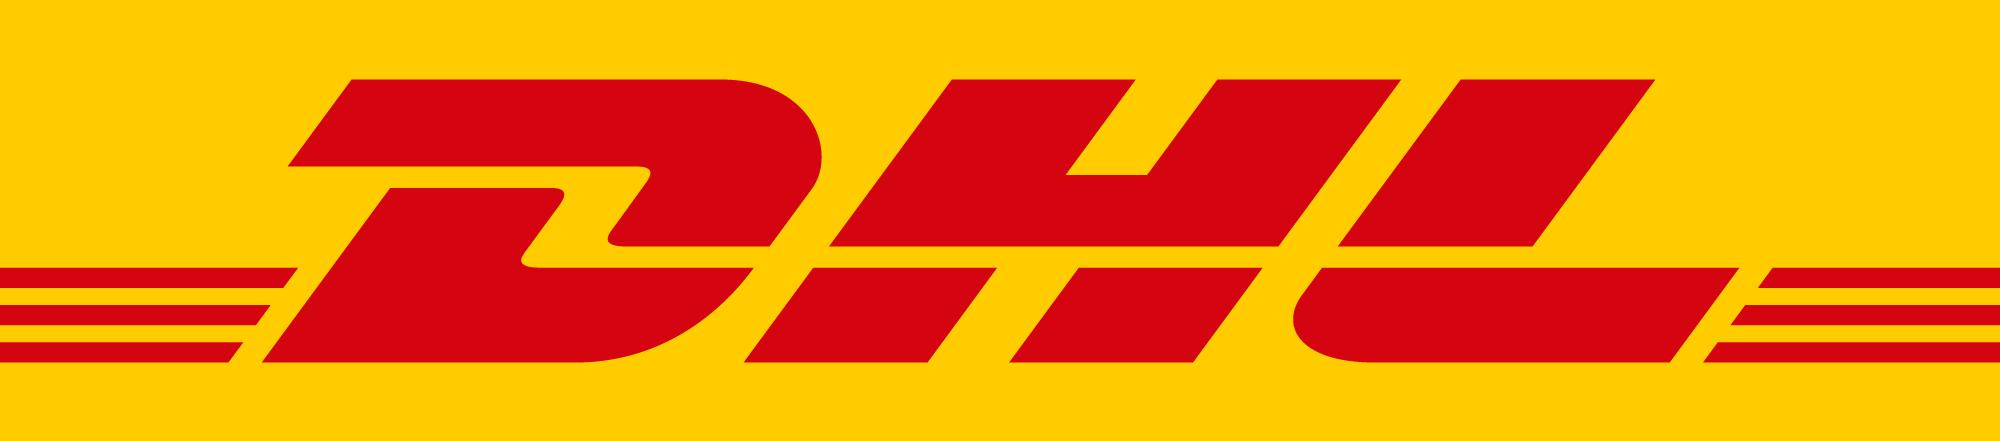 Fotografia Logotipo DHL